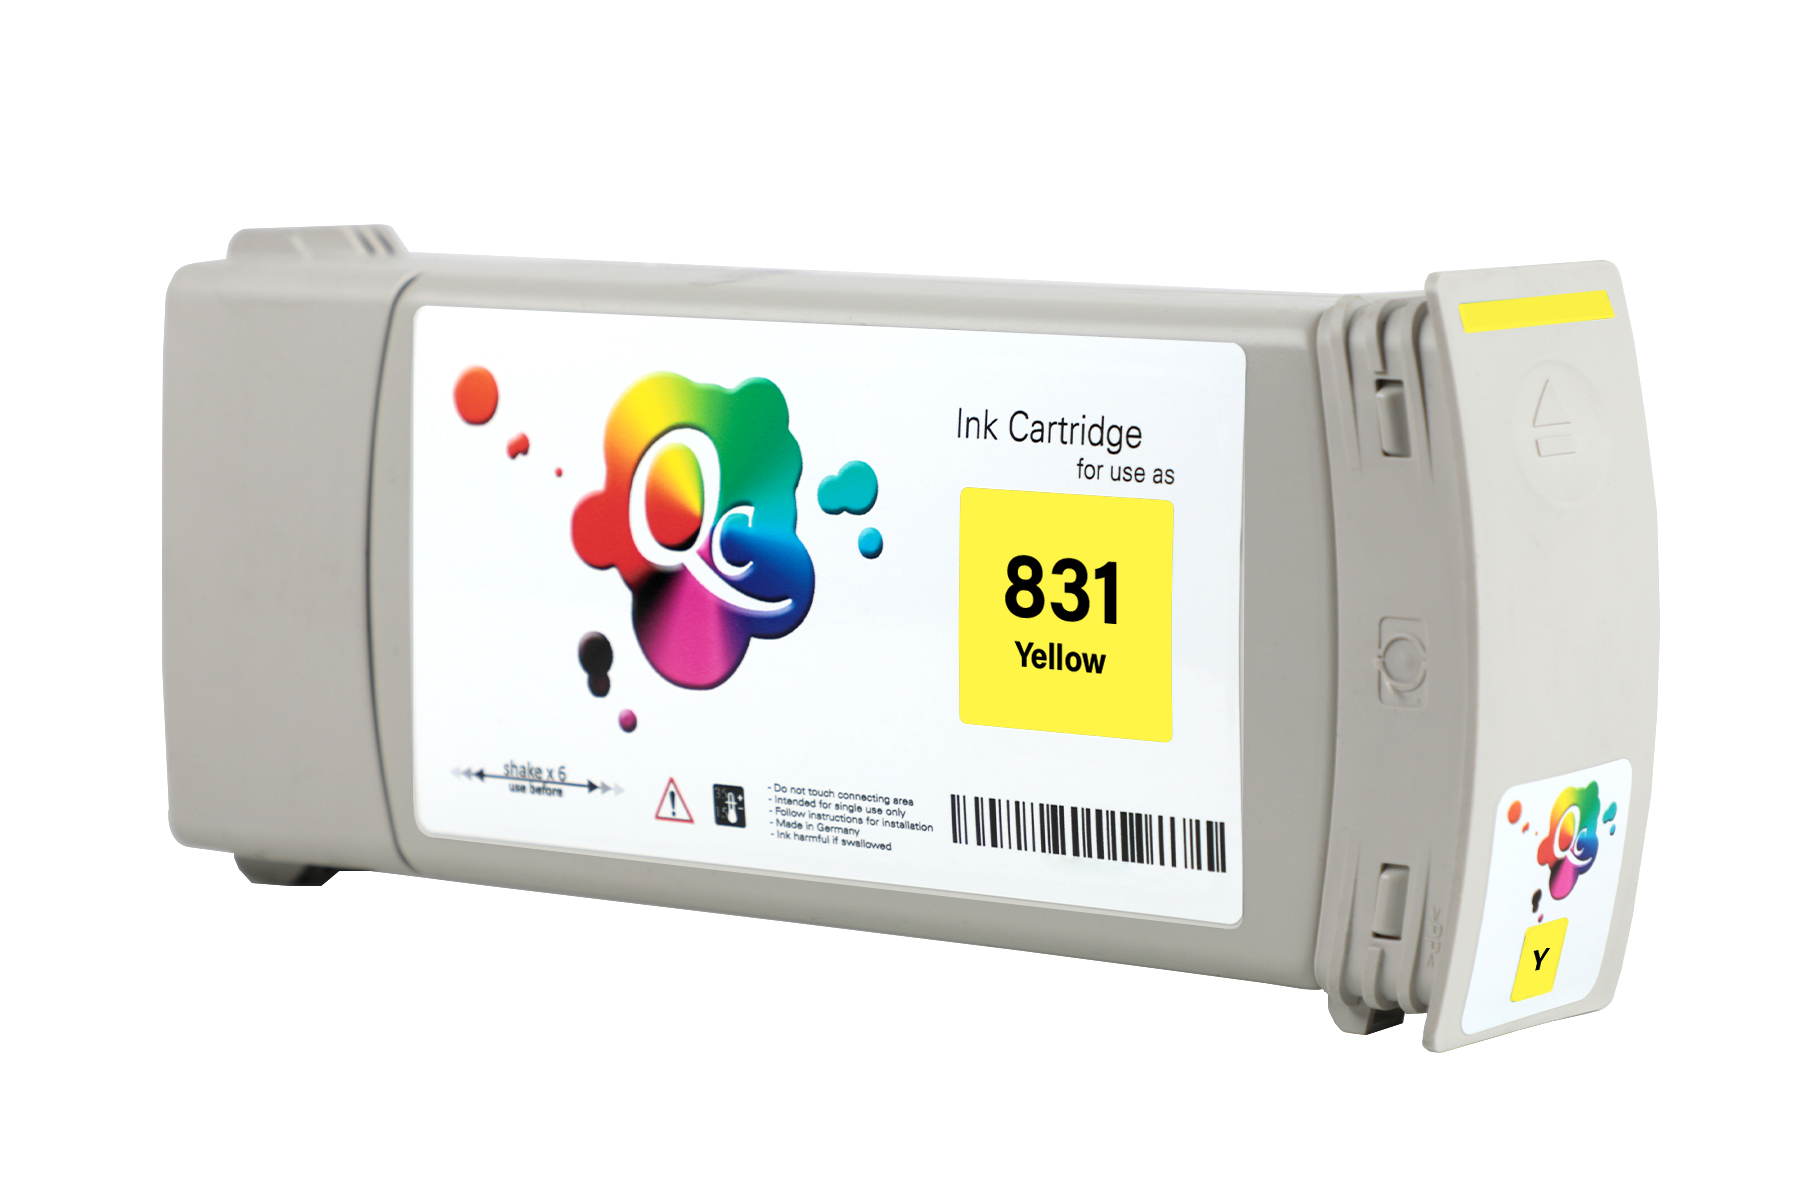 HP 831 CZ697A Yellow Sarı Lateks Muadil Mürekkep Kartuş 775ml